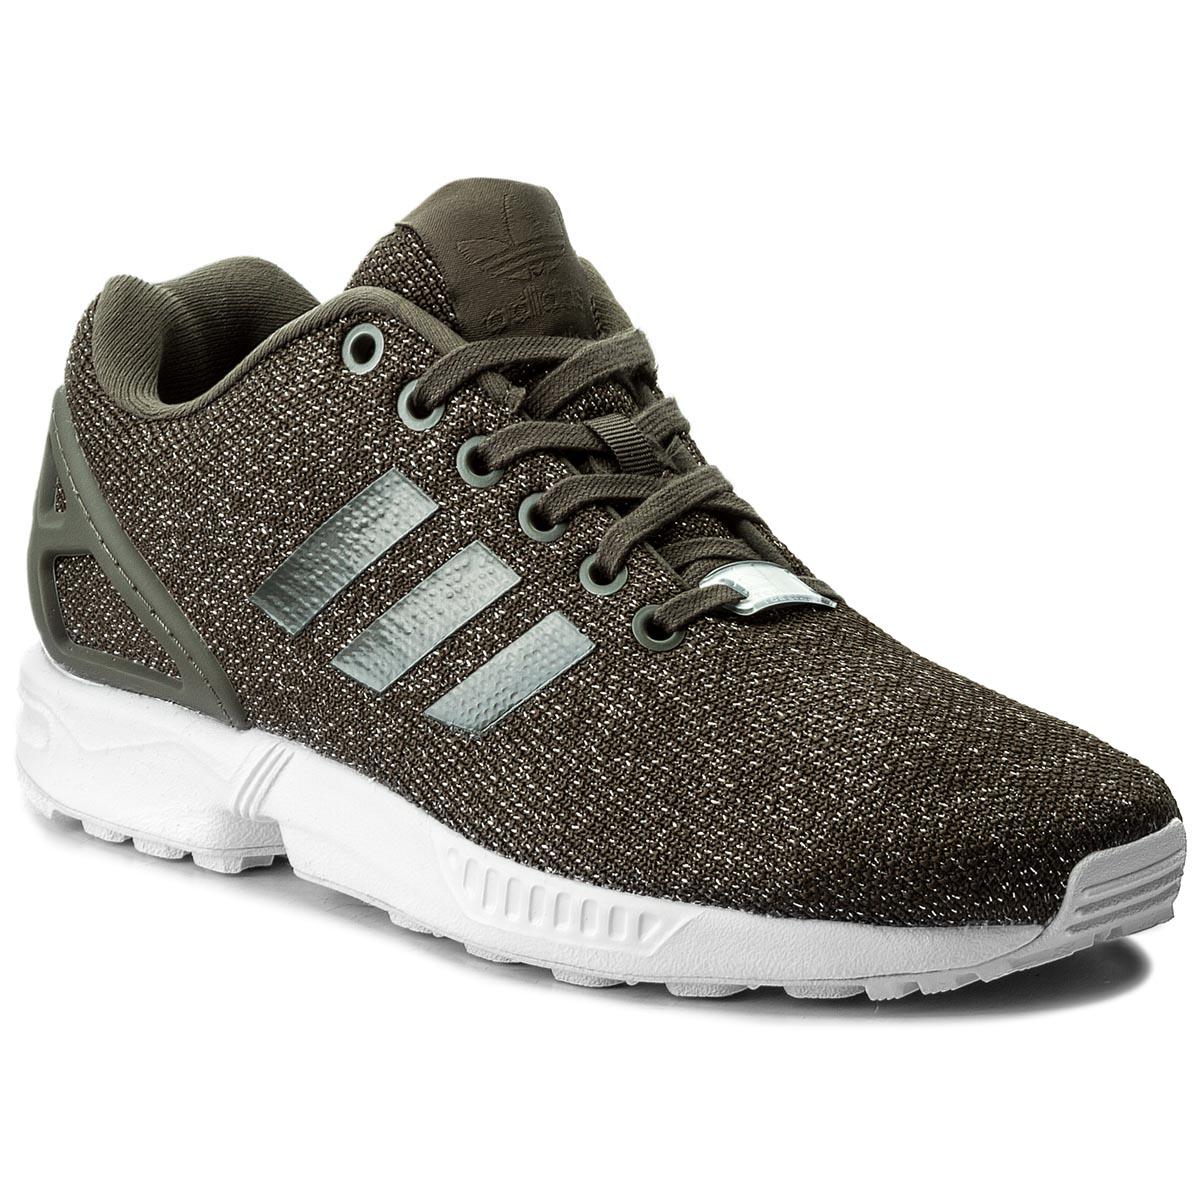 reputable site 777b3 62c64 Shoes adidas - Zx Flux K M21294 Black/FTWWhite - Sneakers ...